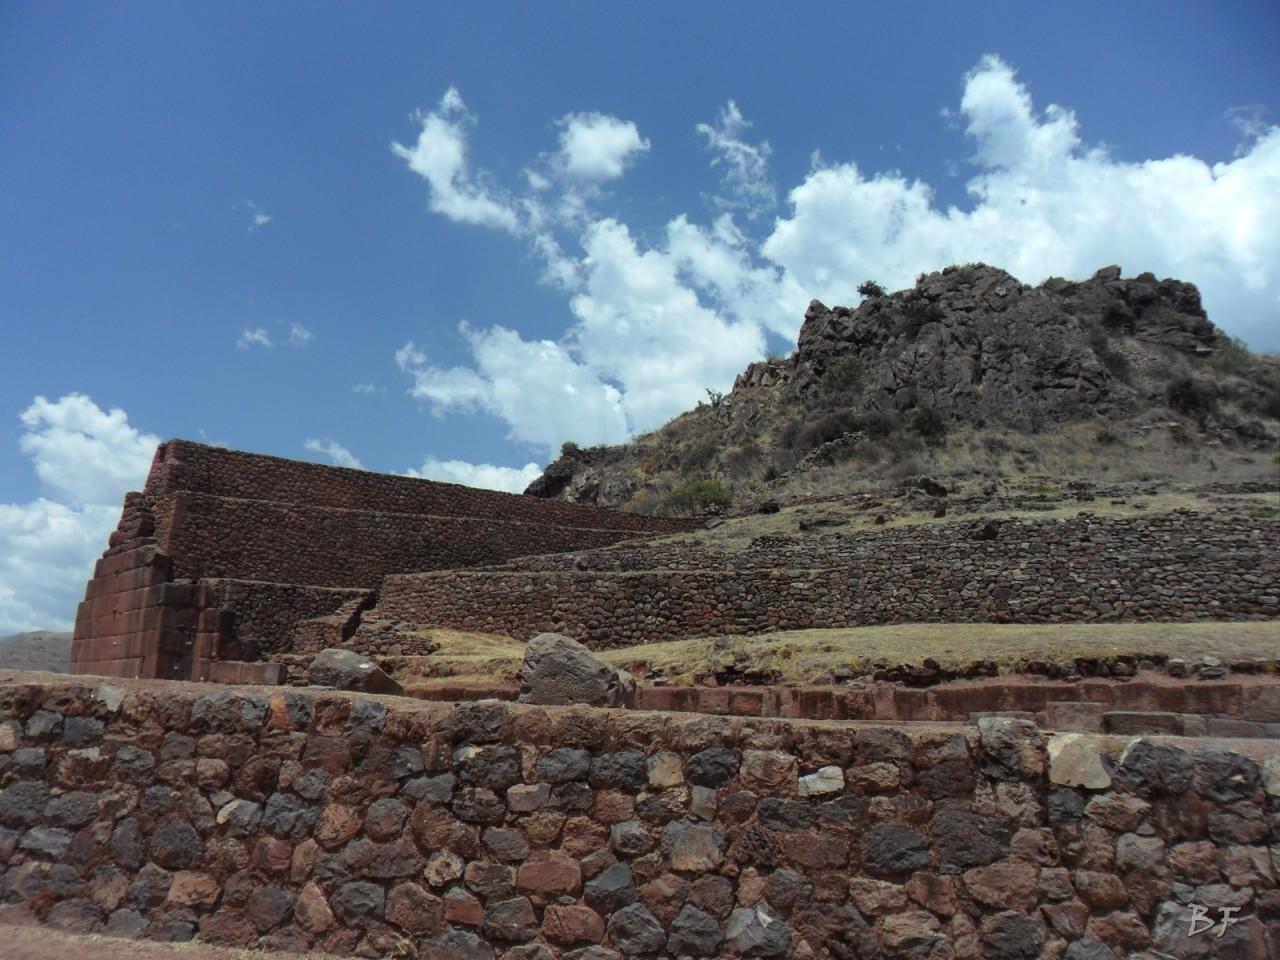 Parco-Archeologico-Megaliti-Rumicolca-Cusco-Perù-3